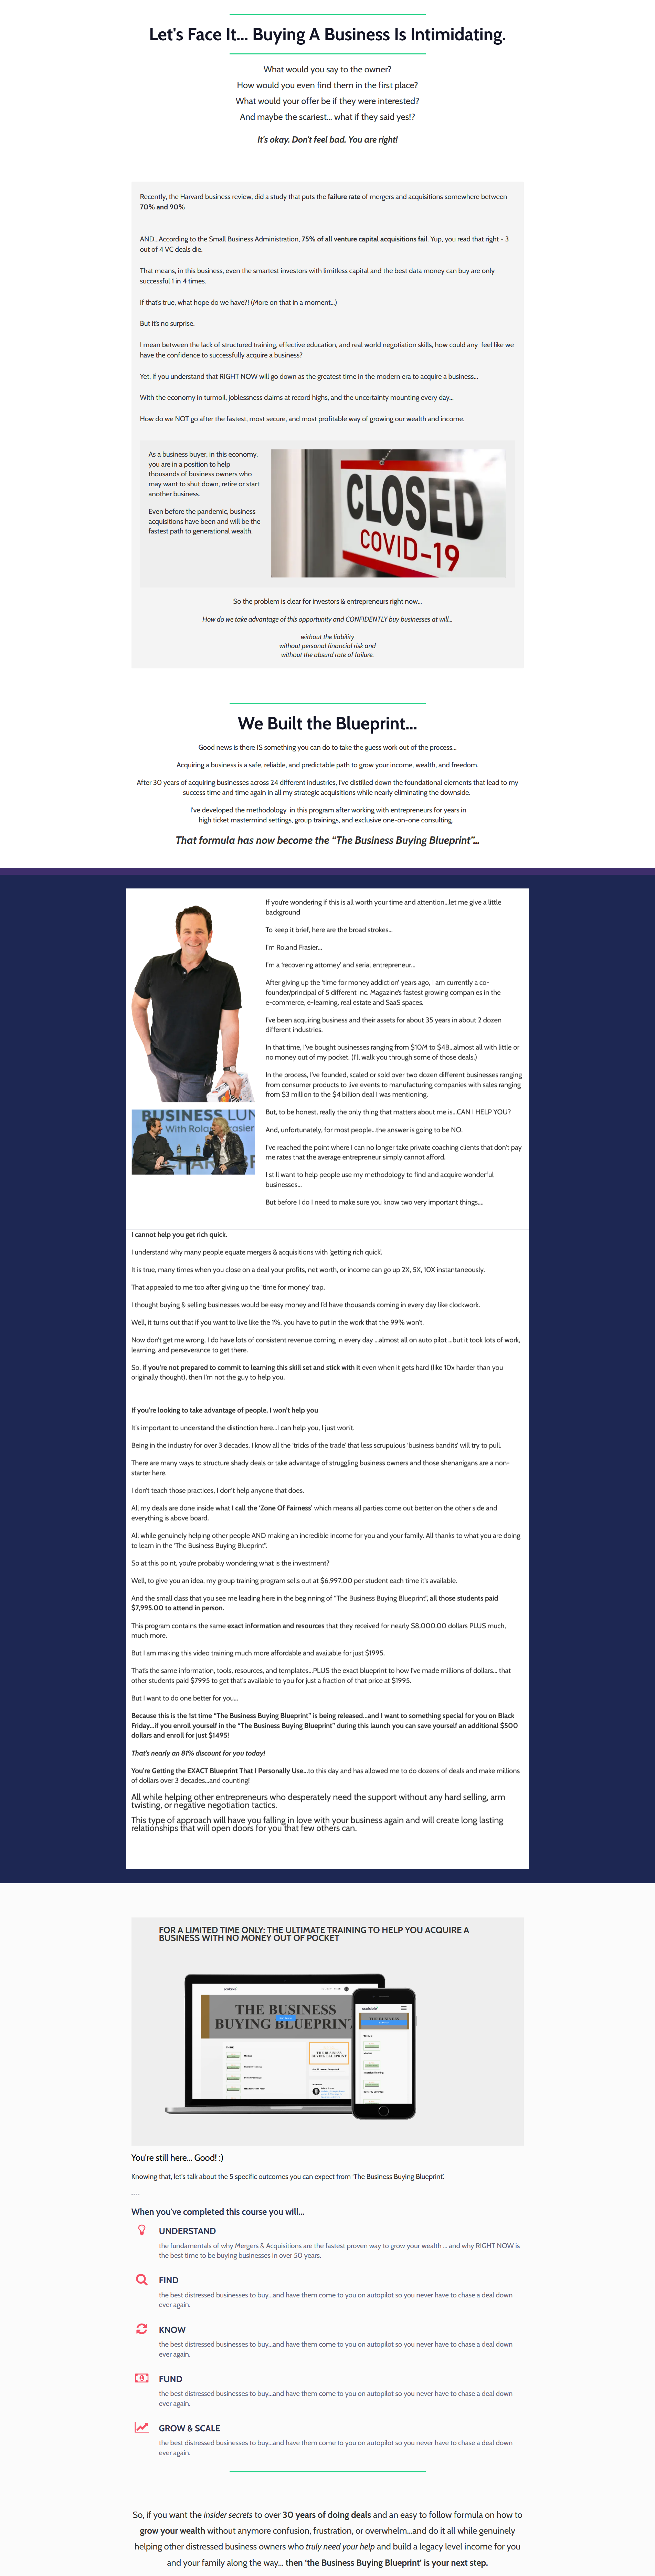 Roland Frasier – EPIC Business Buying Blueprint